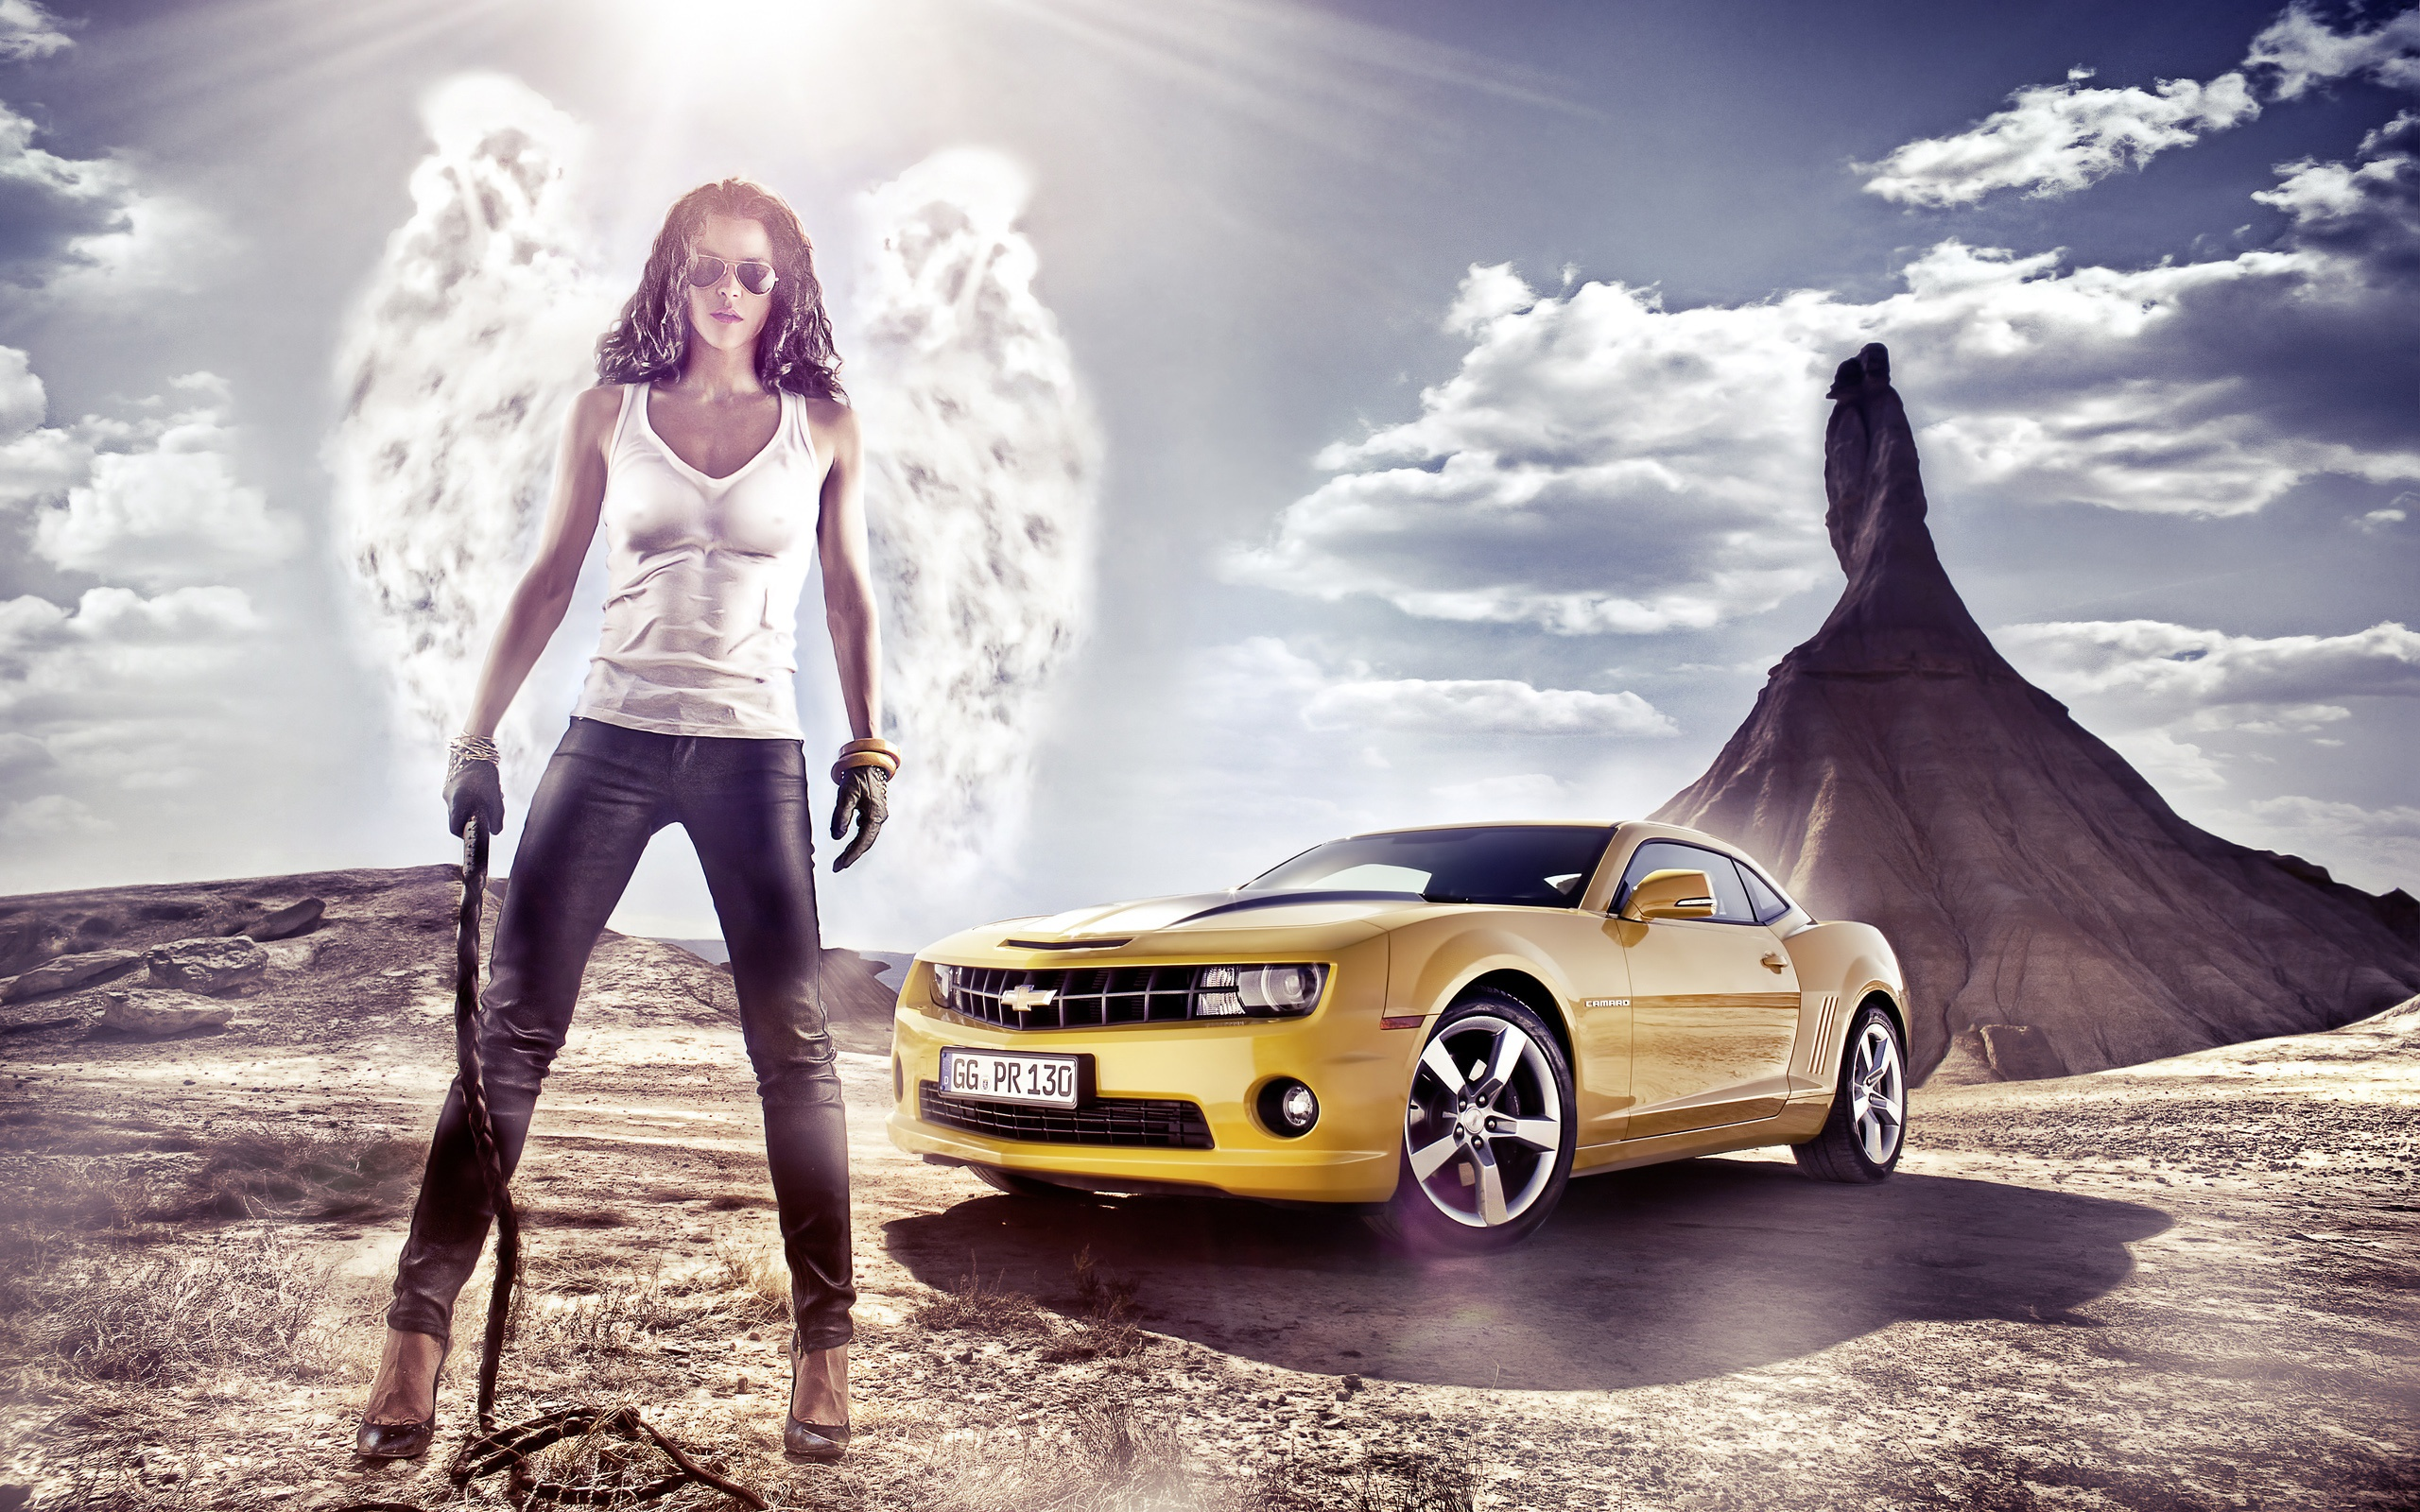 girls and cars pics - photo #13